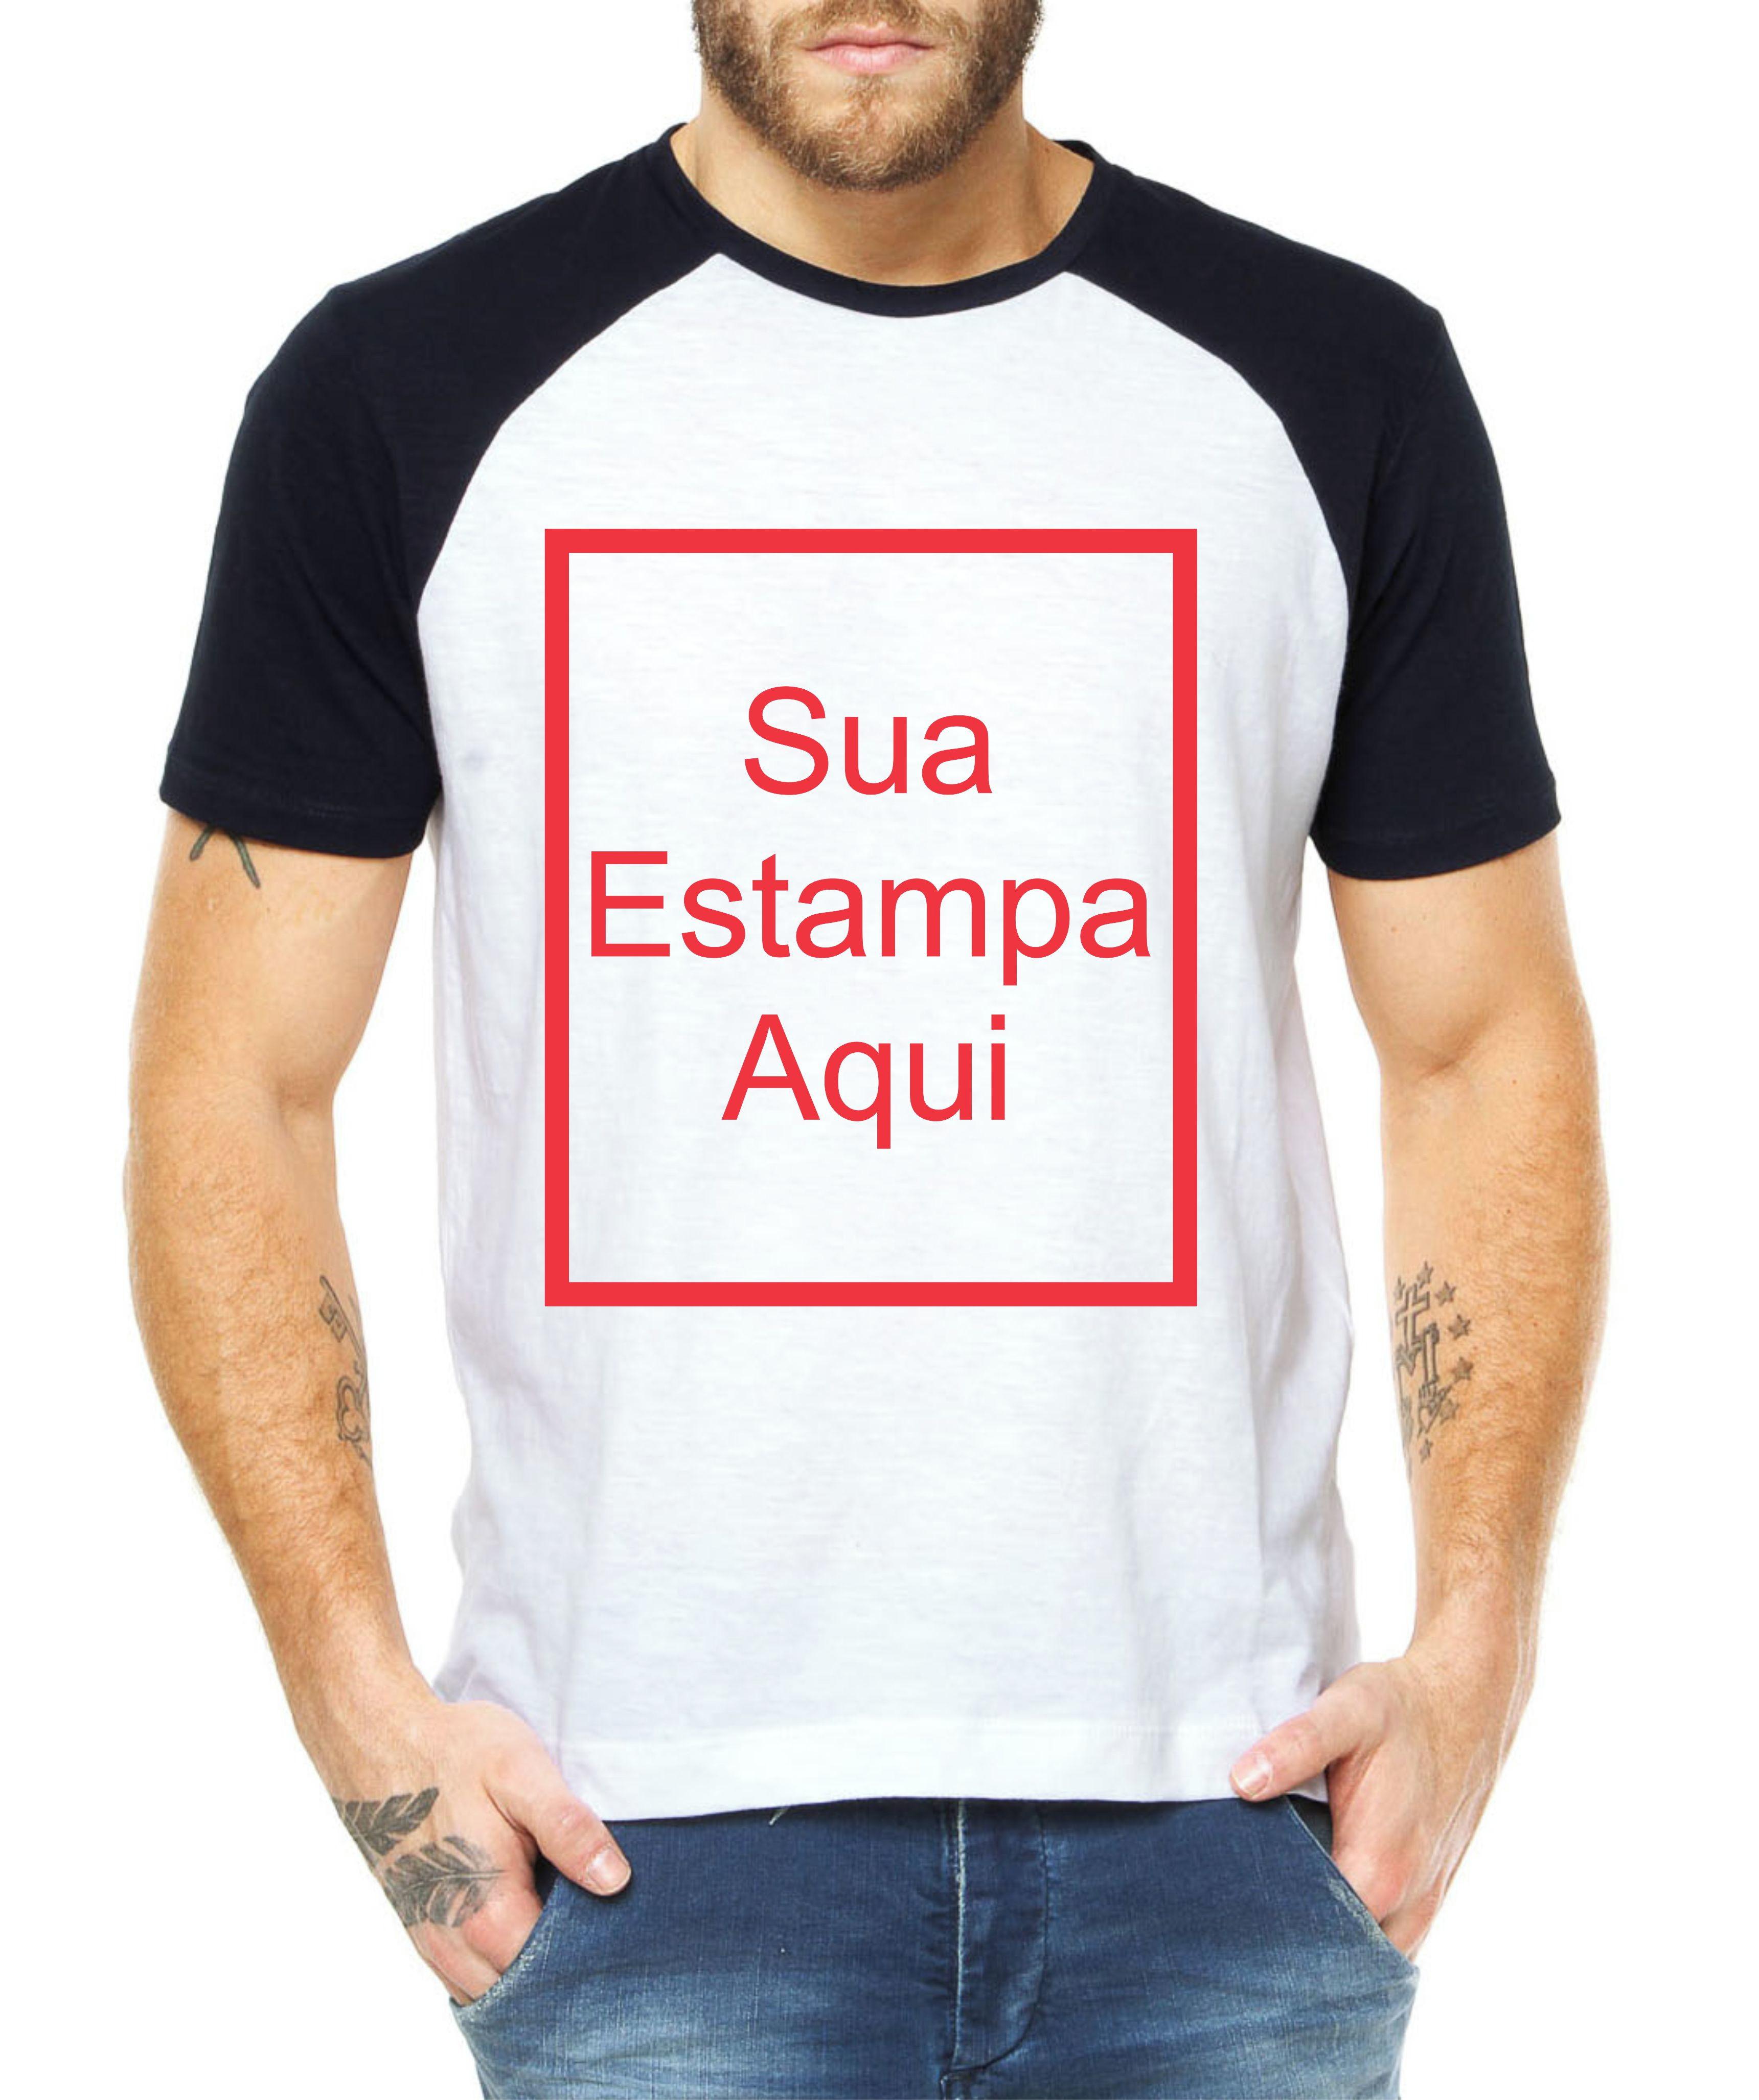 6fab95296b Camiseta Raglan Masculina Personalizada Customizada Camisa